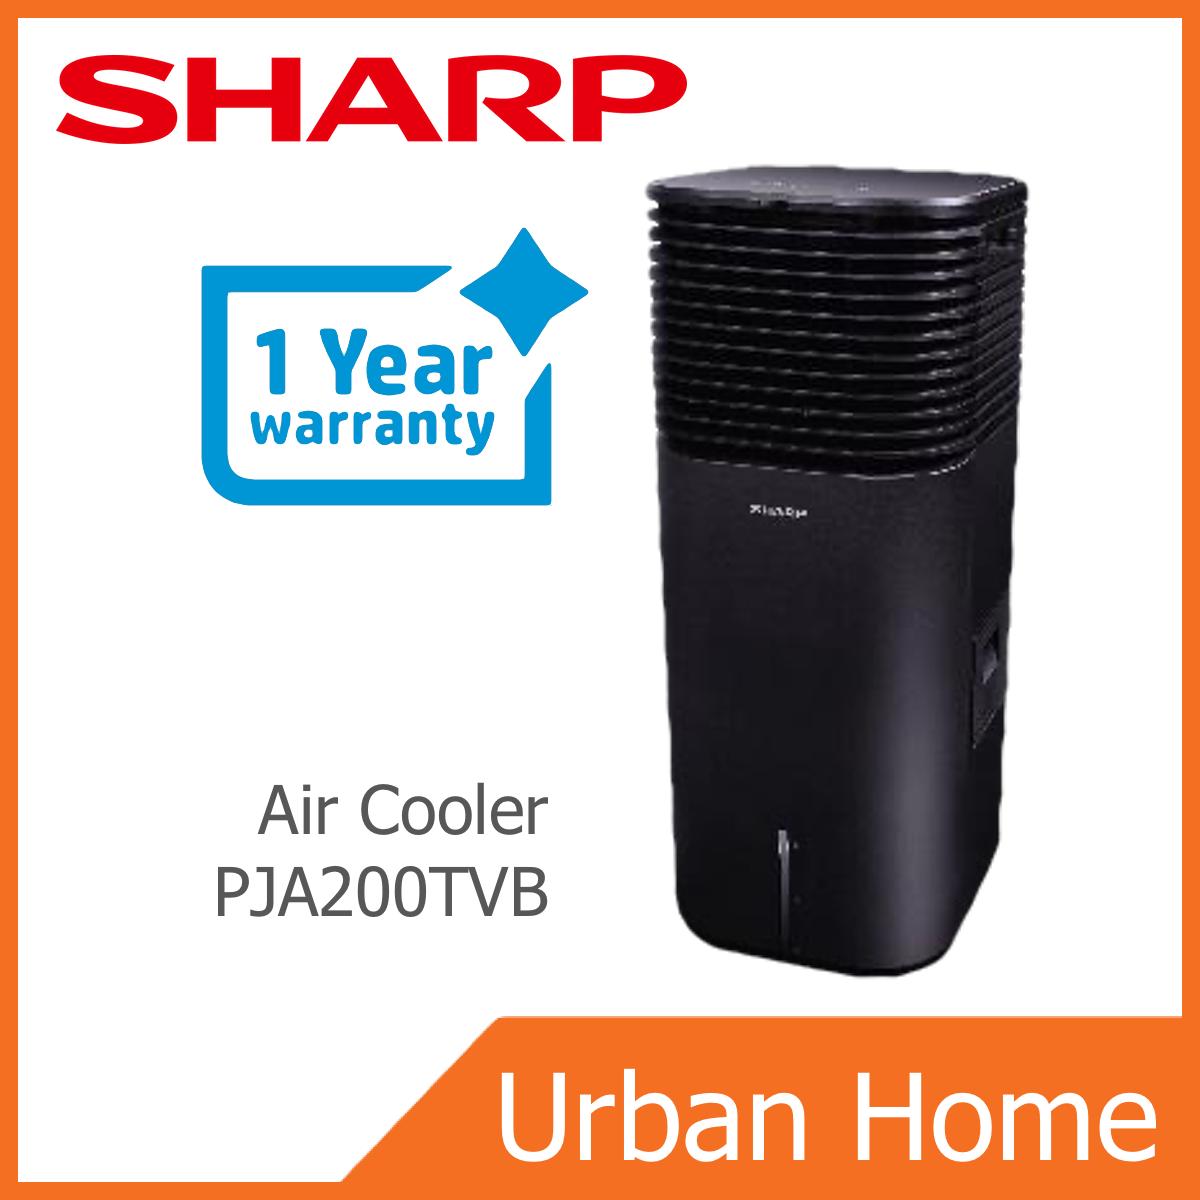 SHARP 20L High Capacity Air Cooler (PJA200TVB)